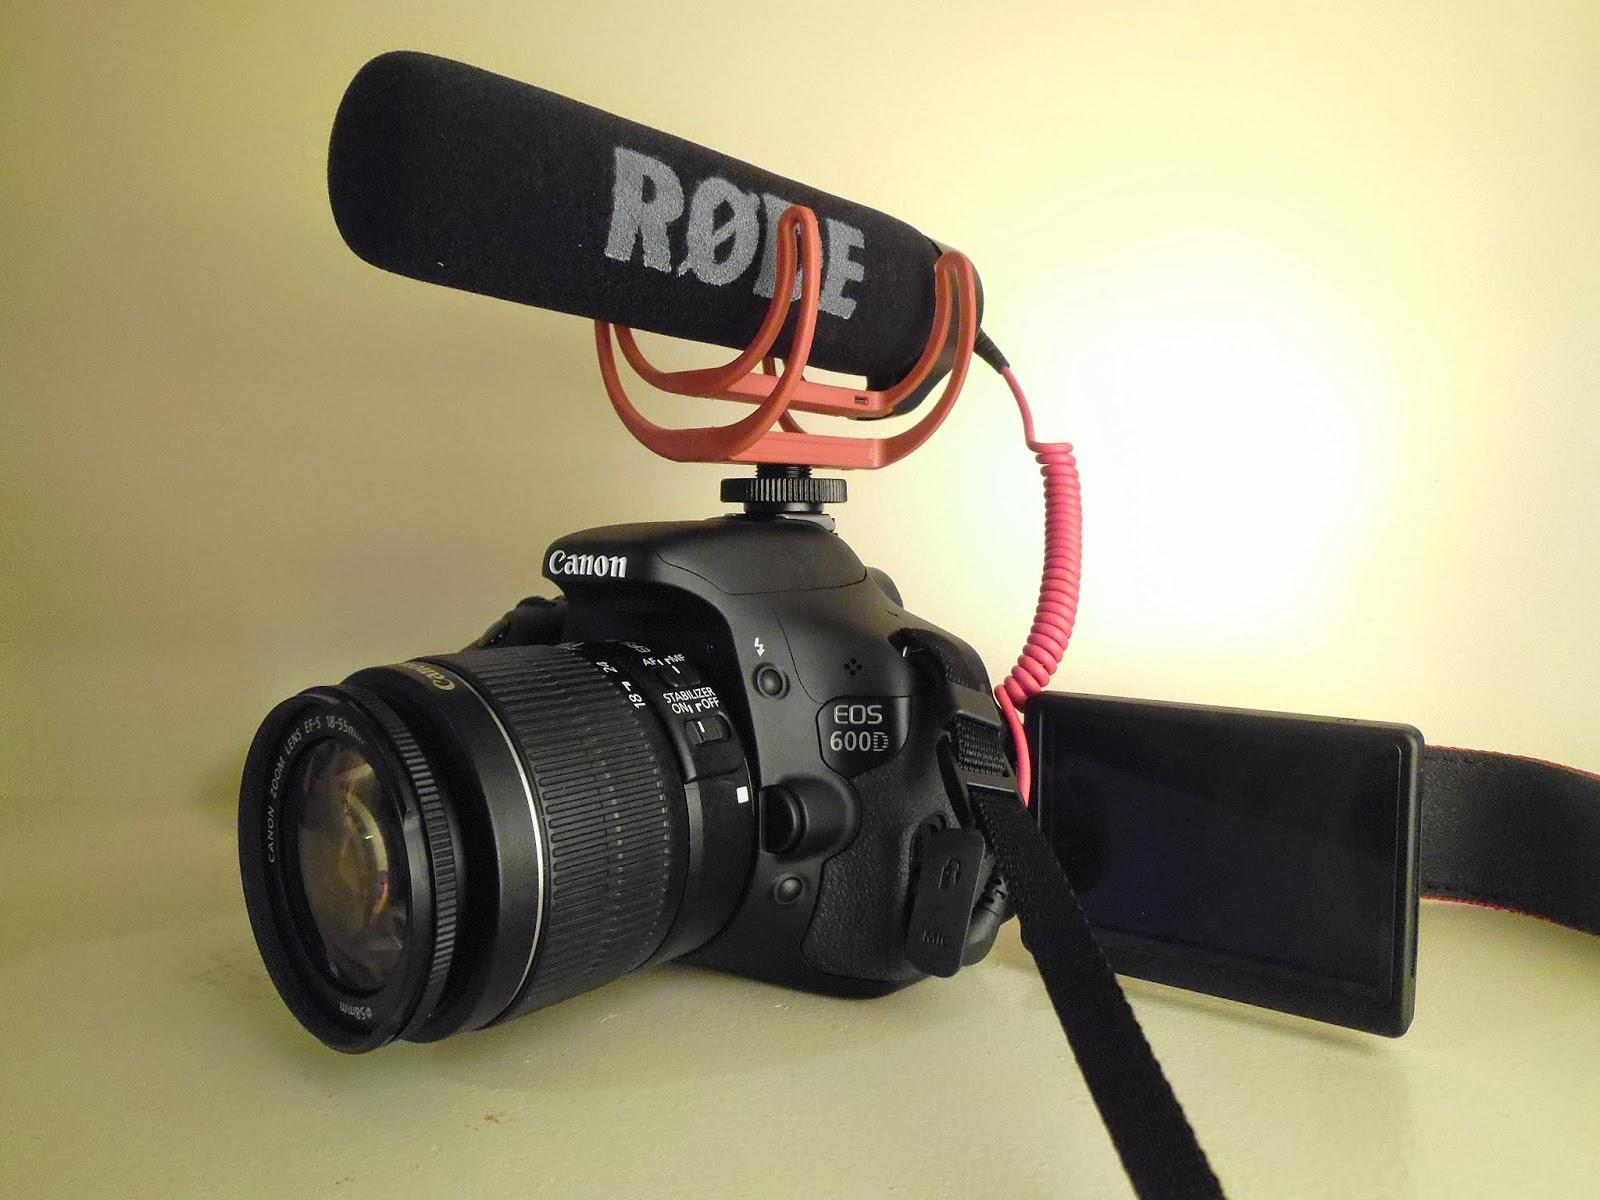 Kiwse: My Filming Setup   Canon 600D/ T3i + Rode VideoMic GO